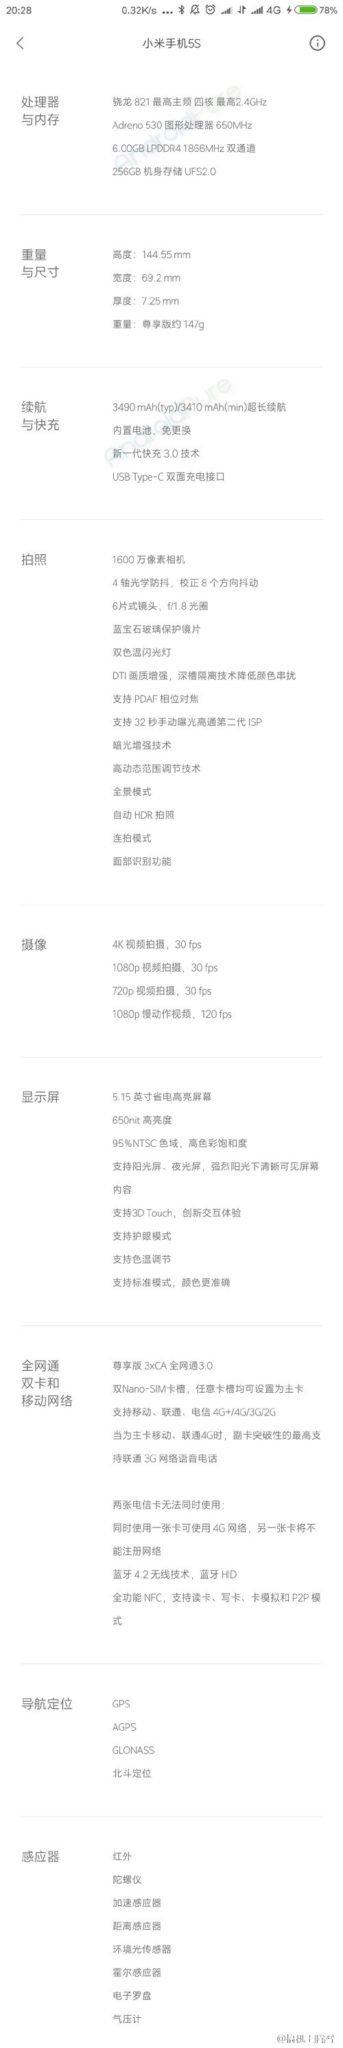 Xiaomi-mi-5s-specs